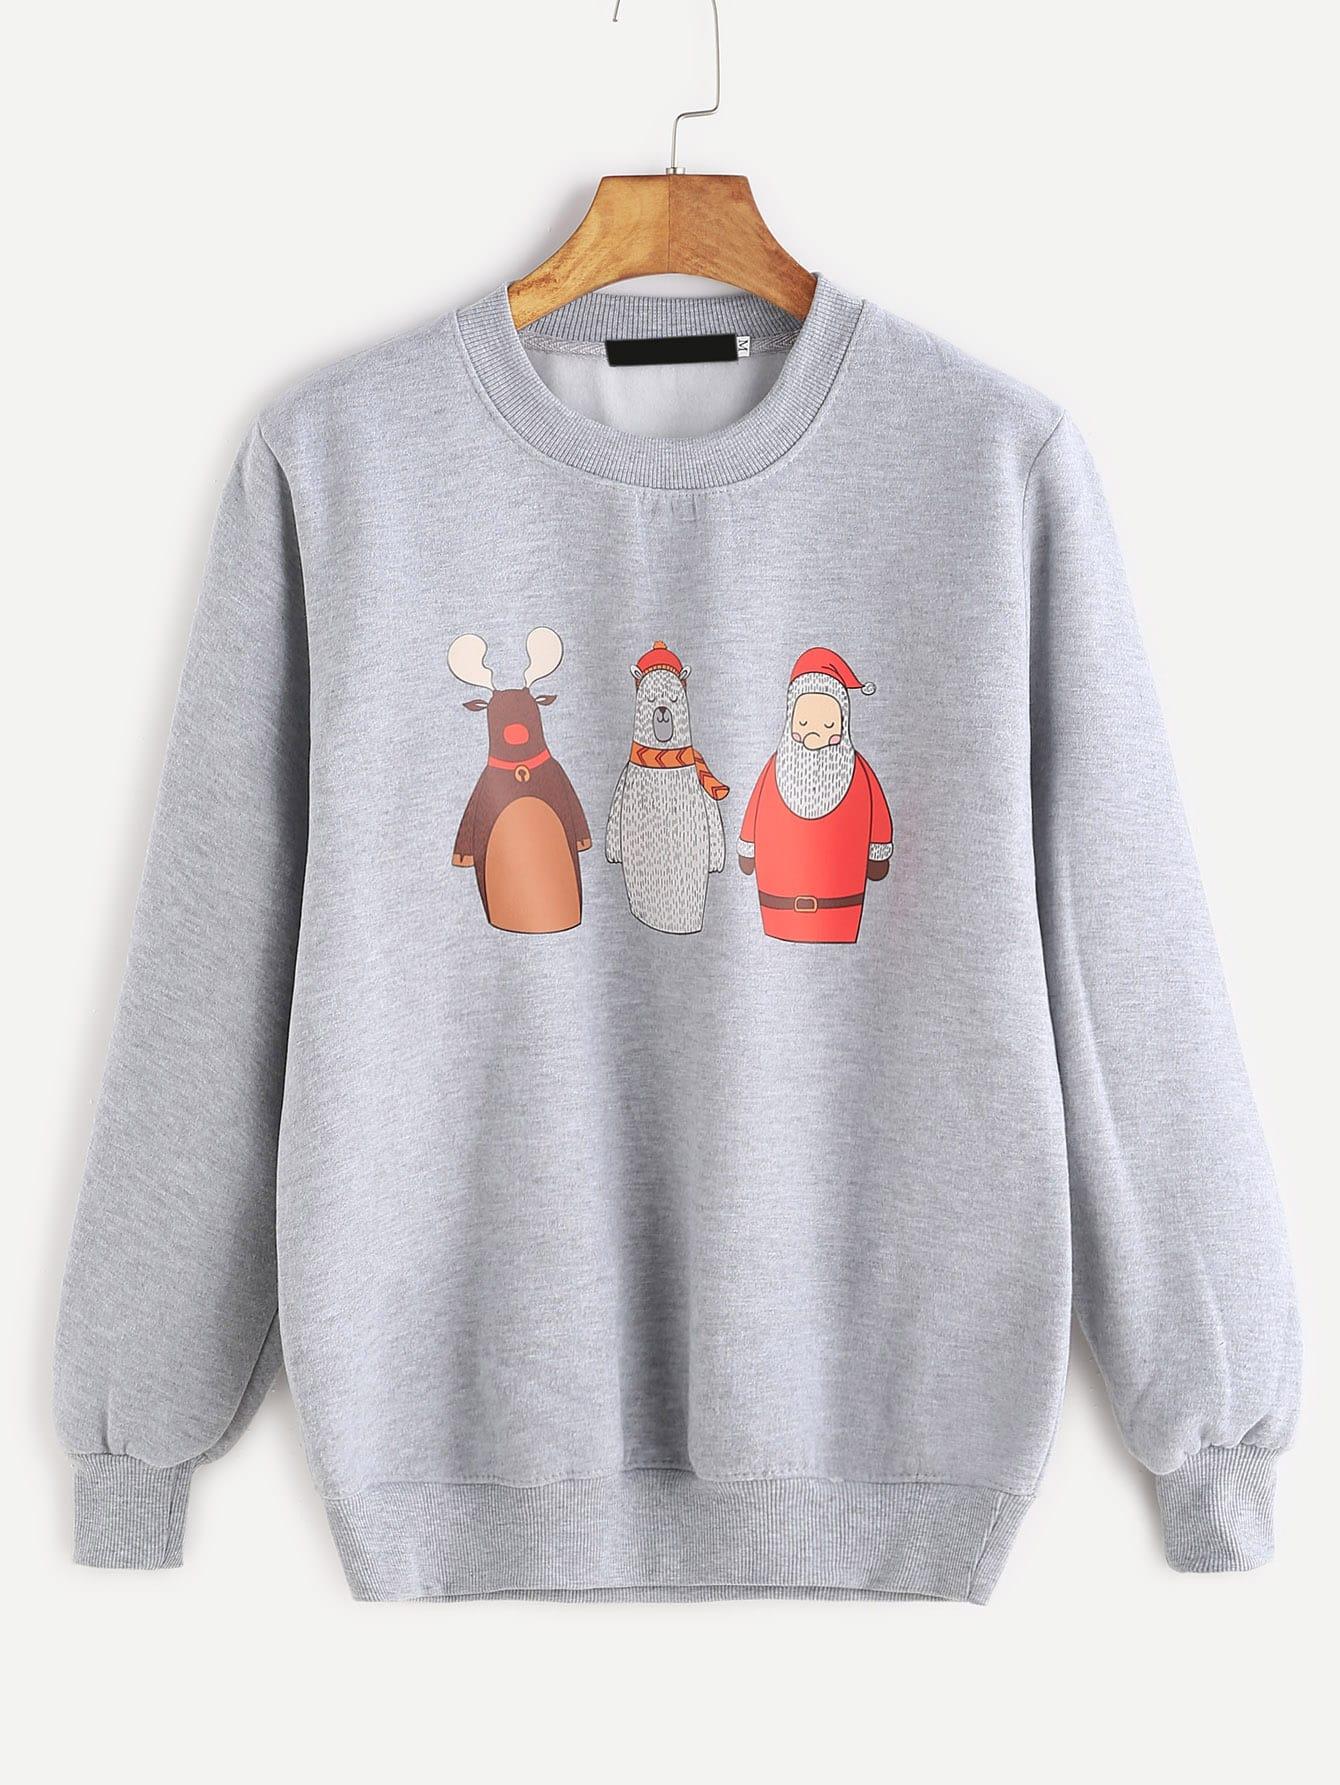 Grey Cartoon Print Ribbed Trim Sweatshirt sweatshirt161118302